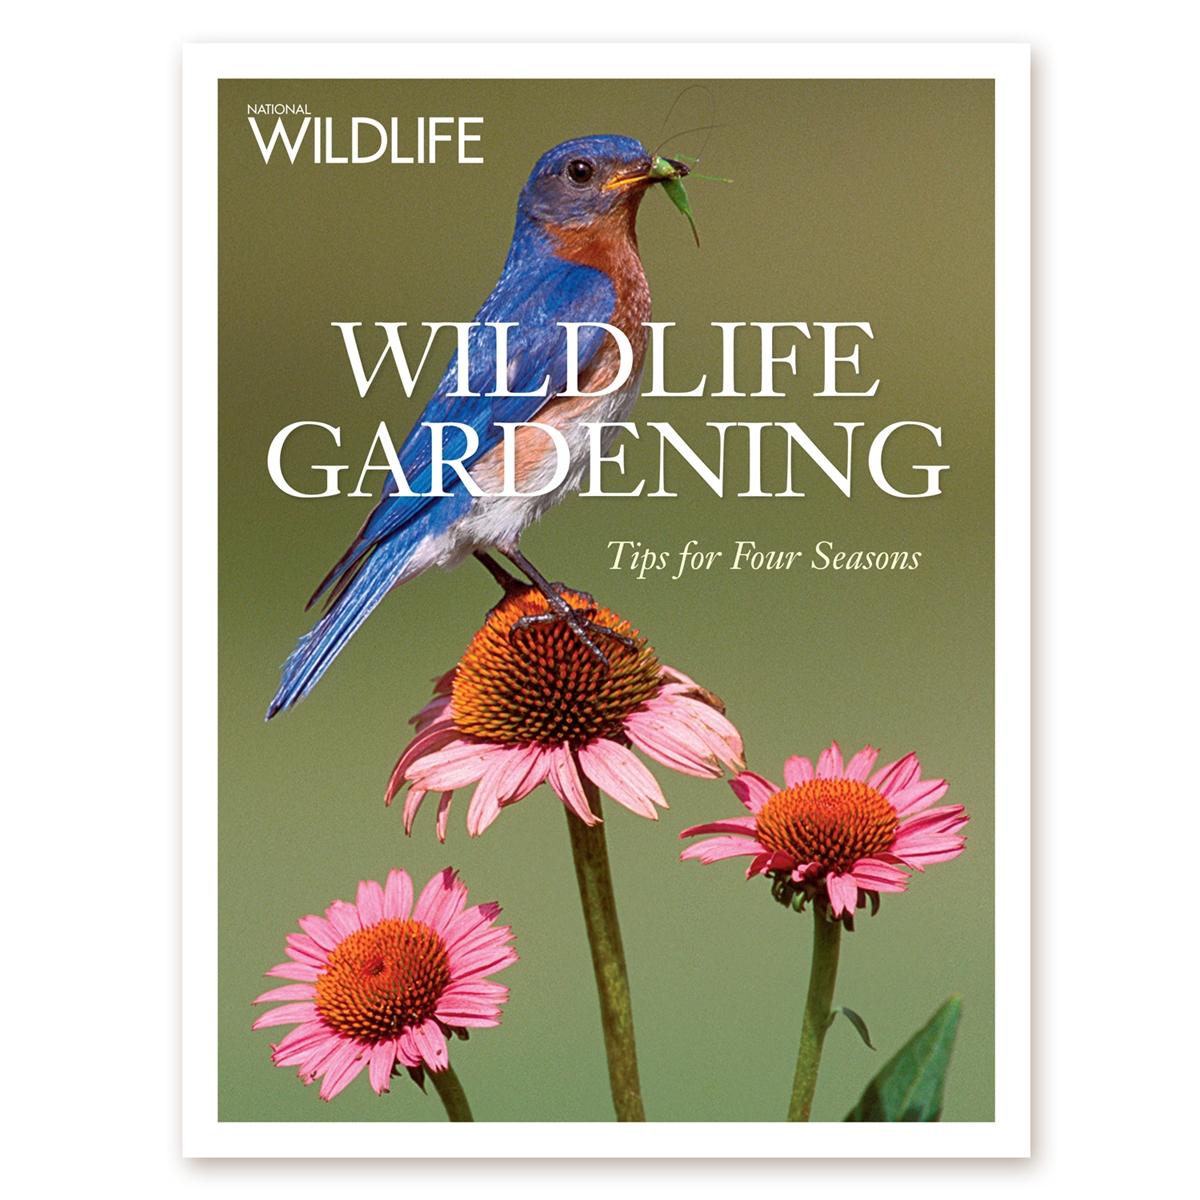 wildlife gardening book tips for four seasons